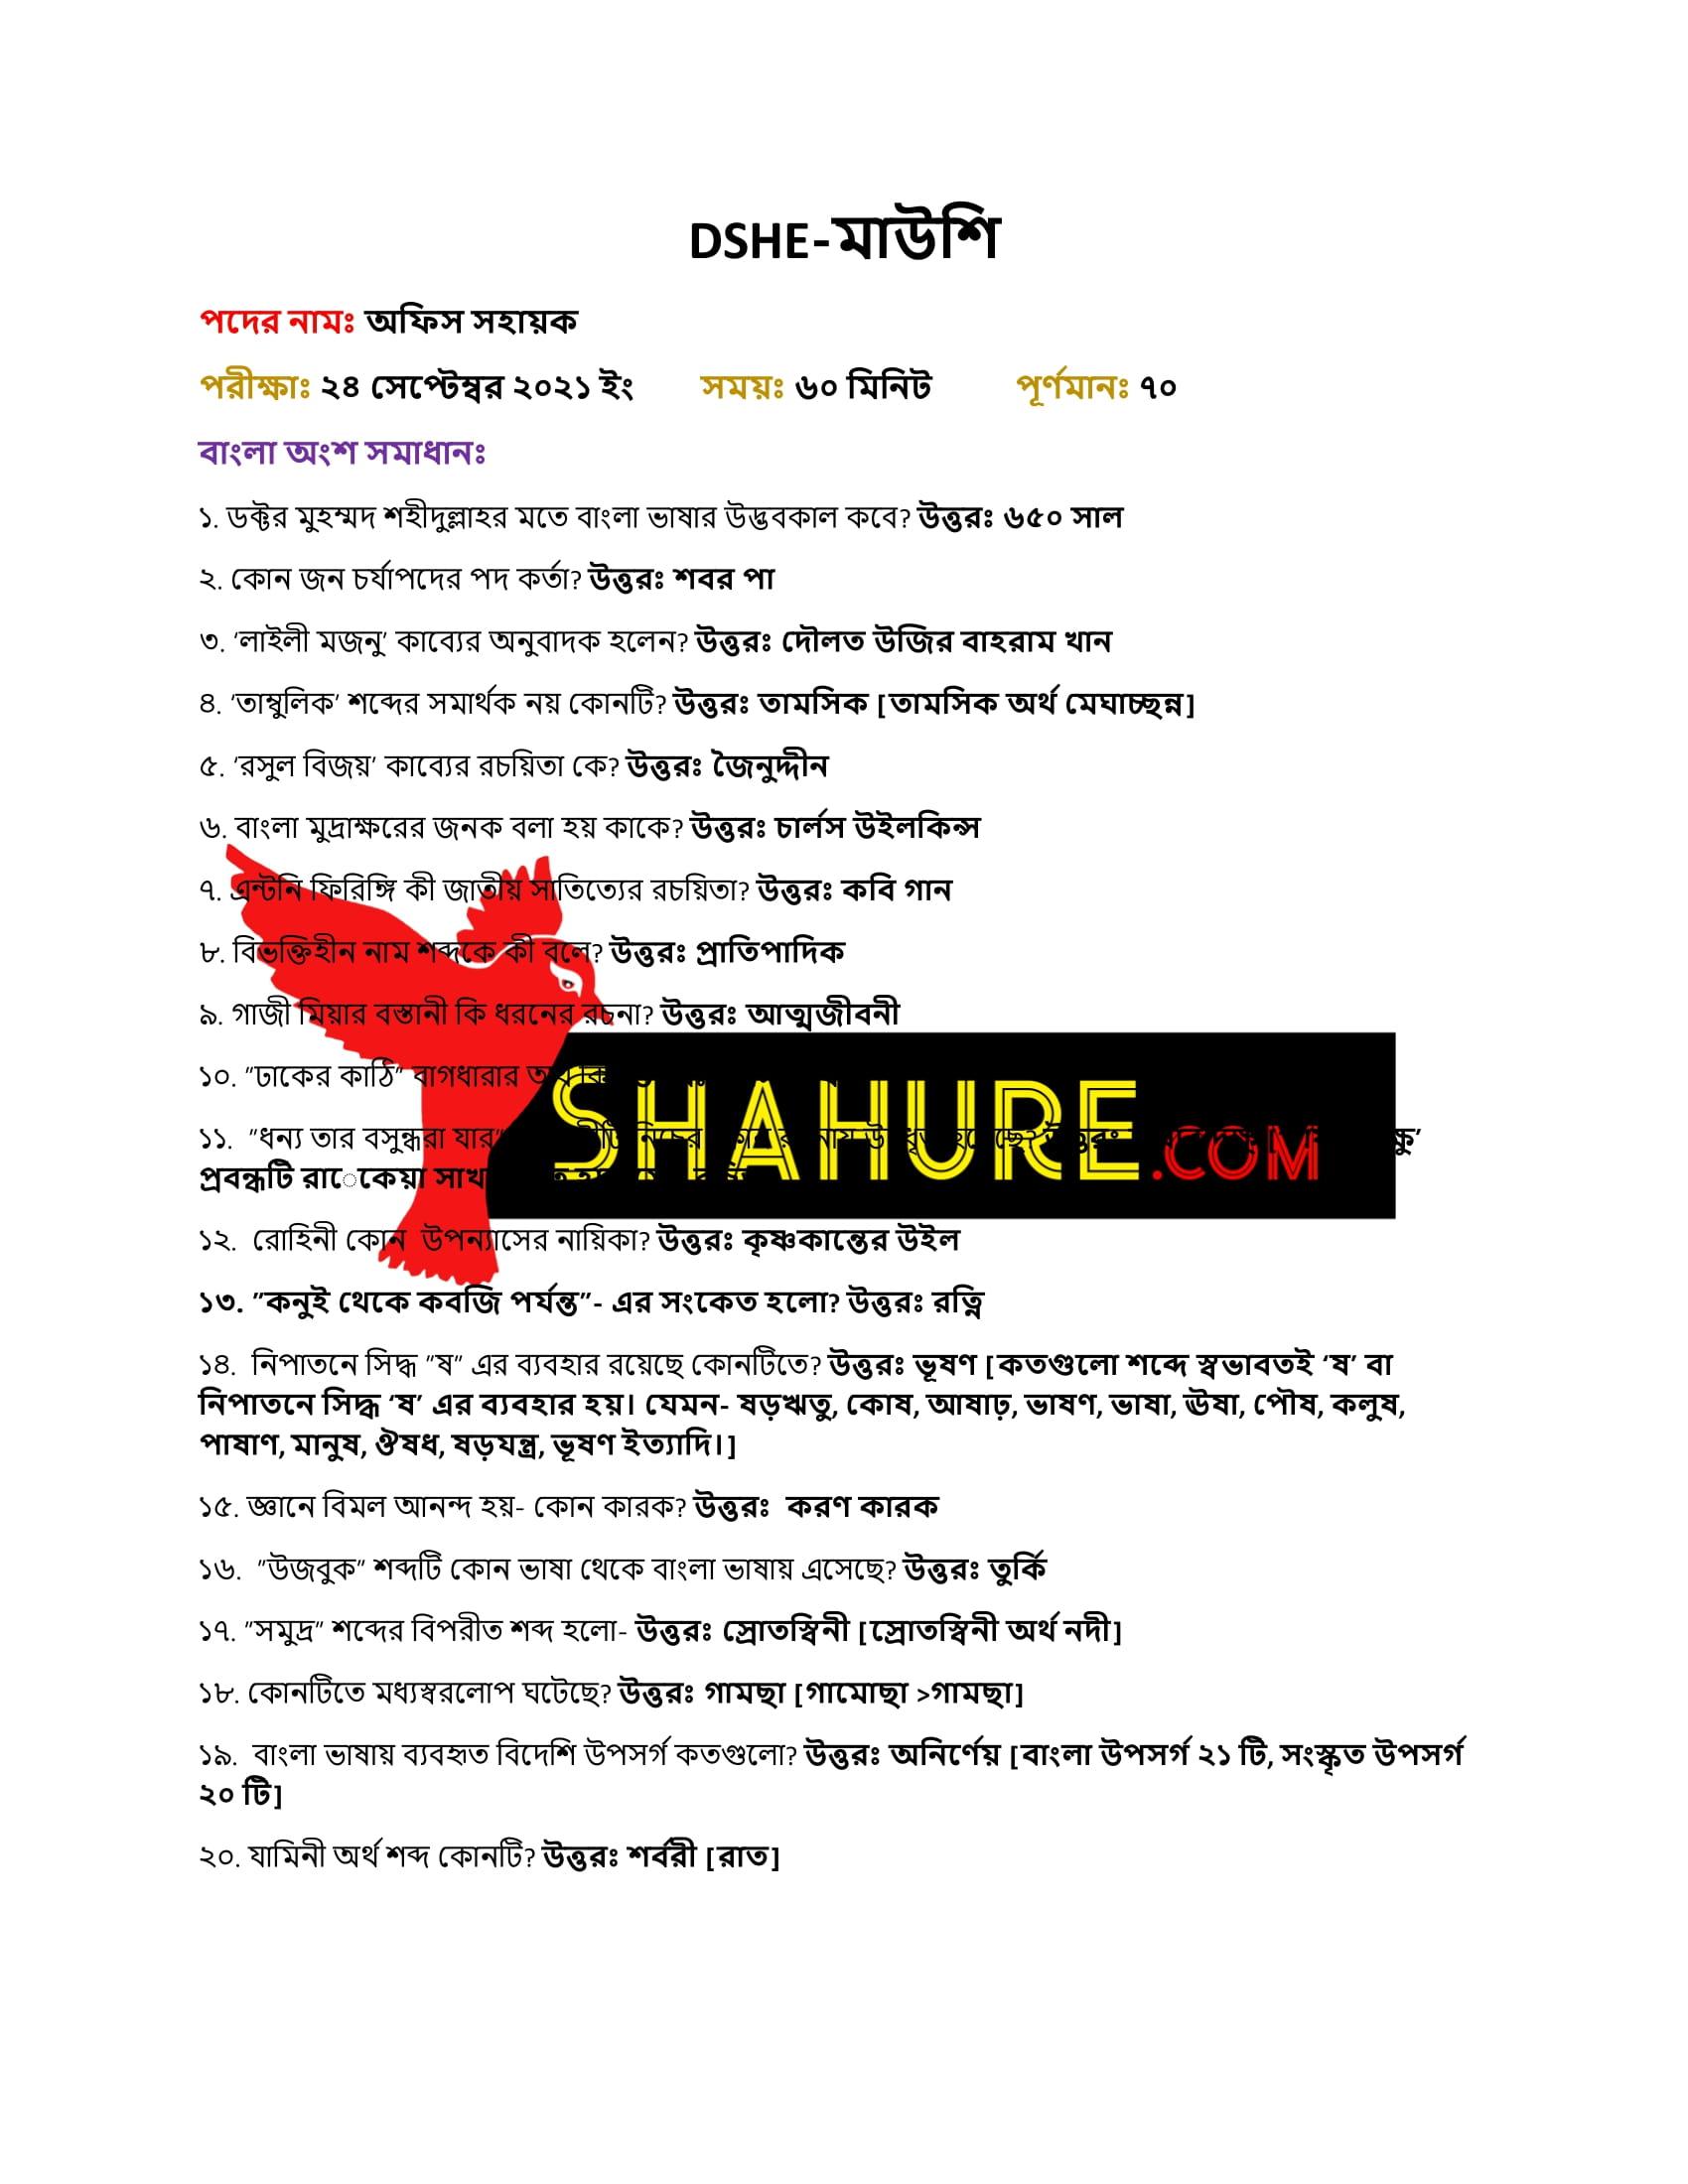 DSHE Office Sohayok Question Solution Bangla